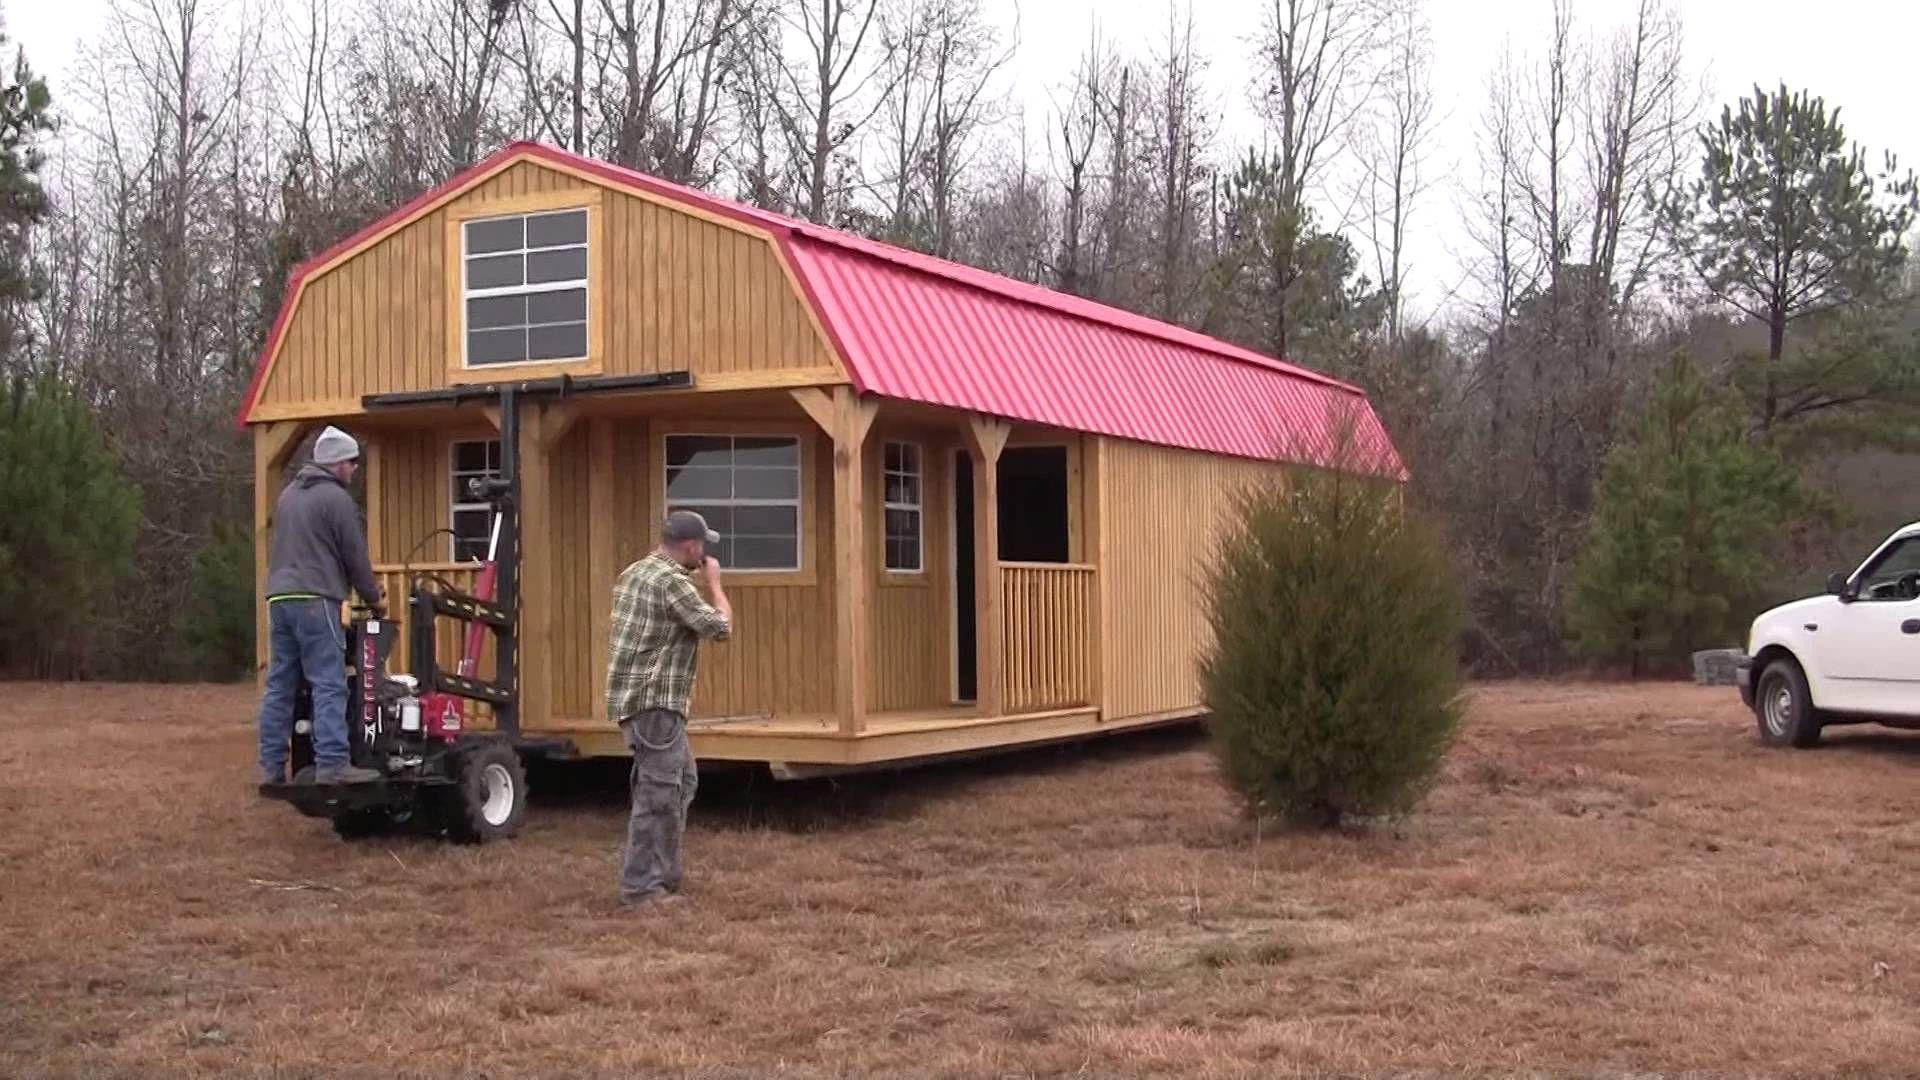 Premier Portable Buildings Barn Delivery (2 Of 2)